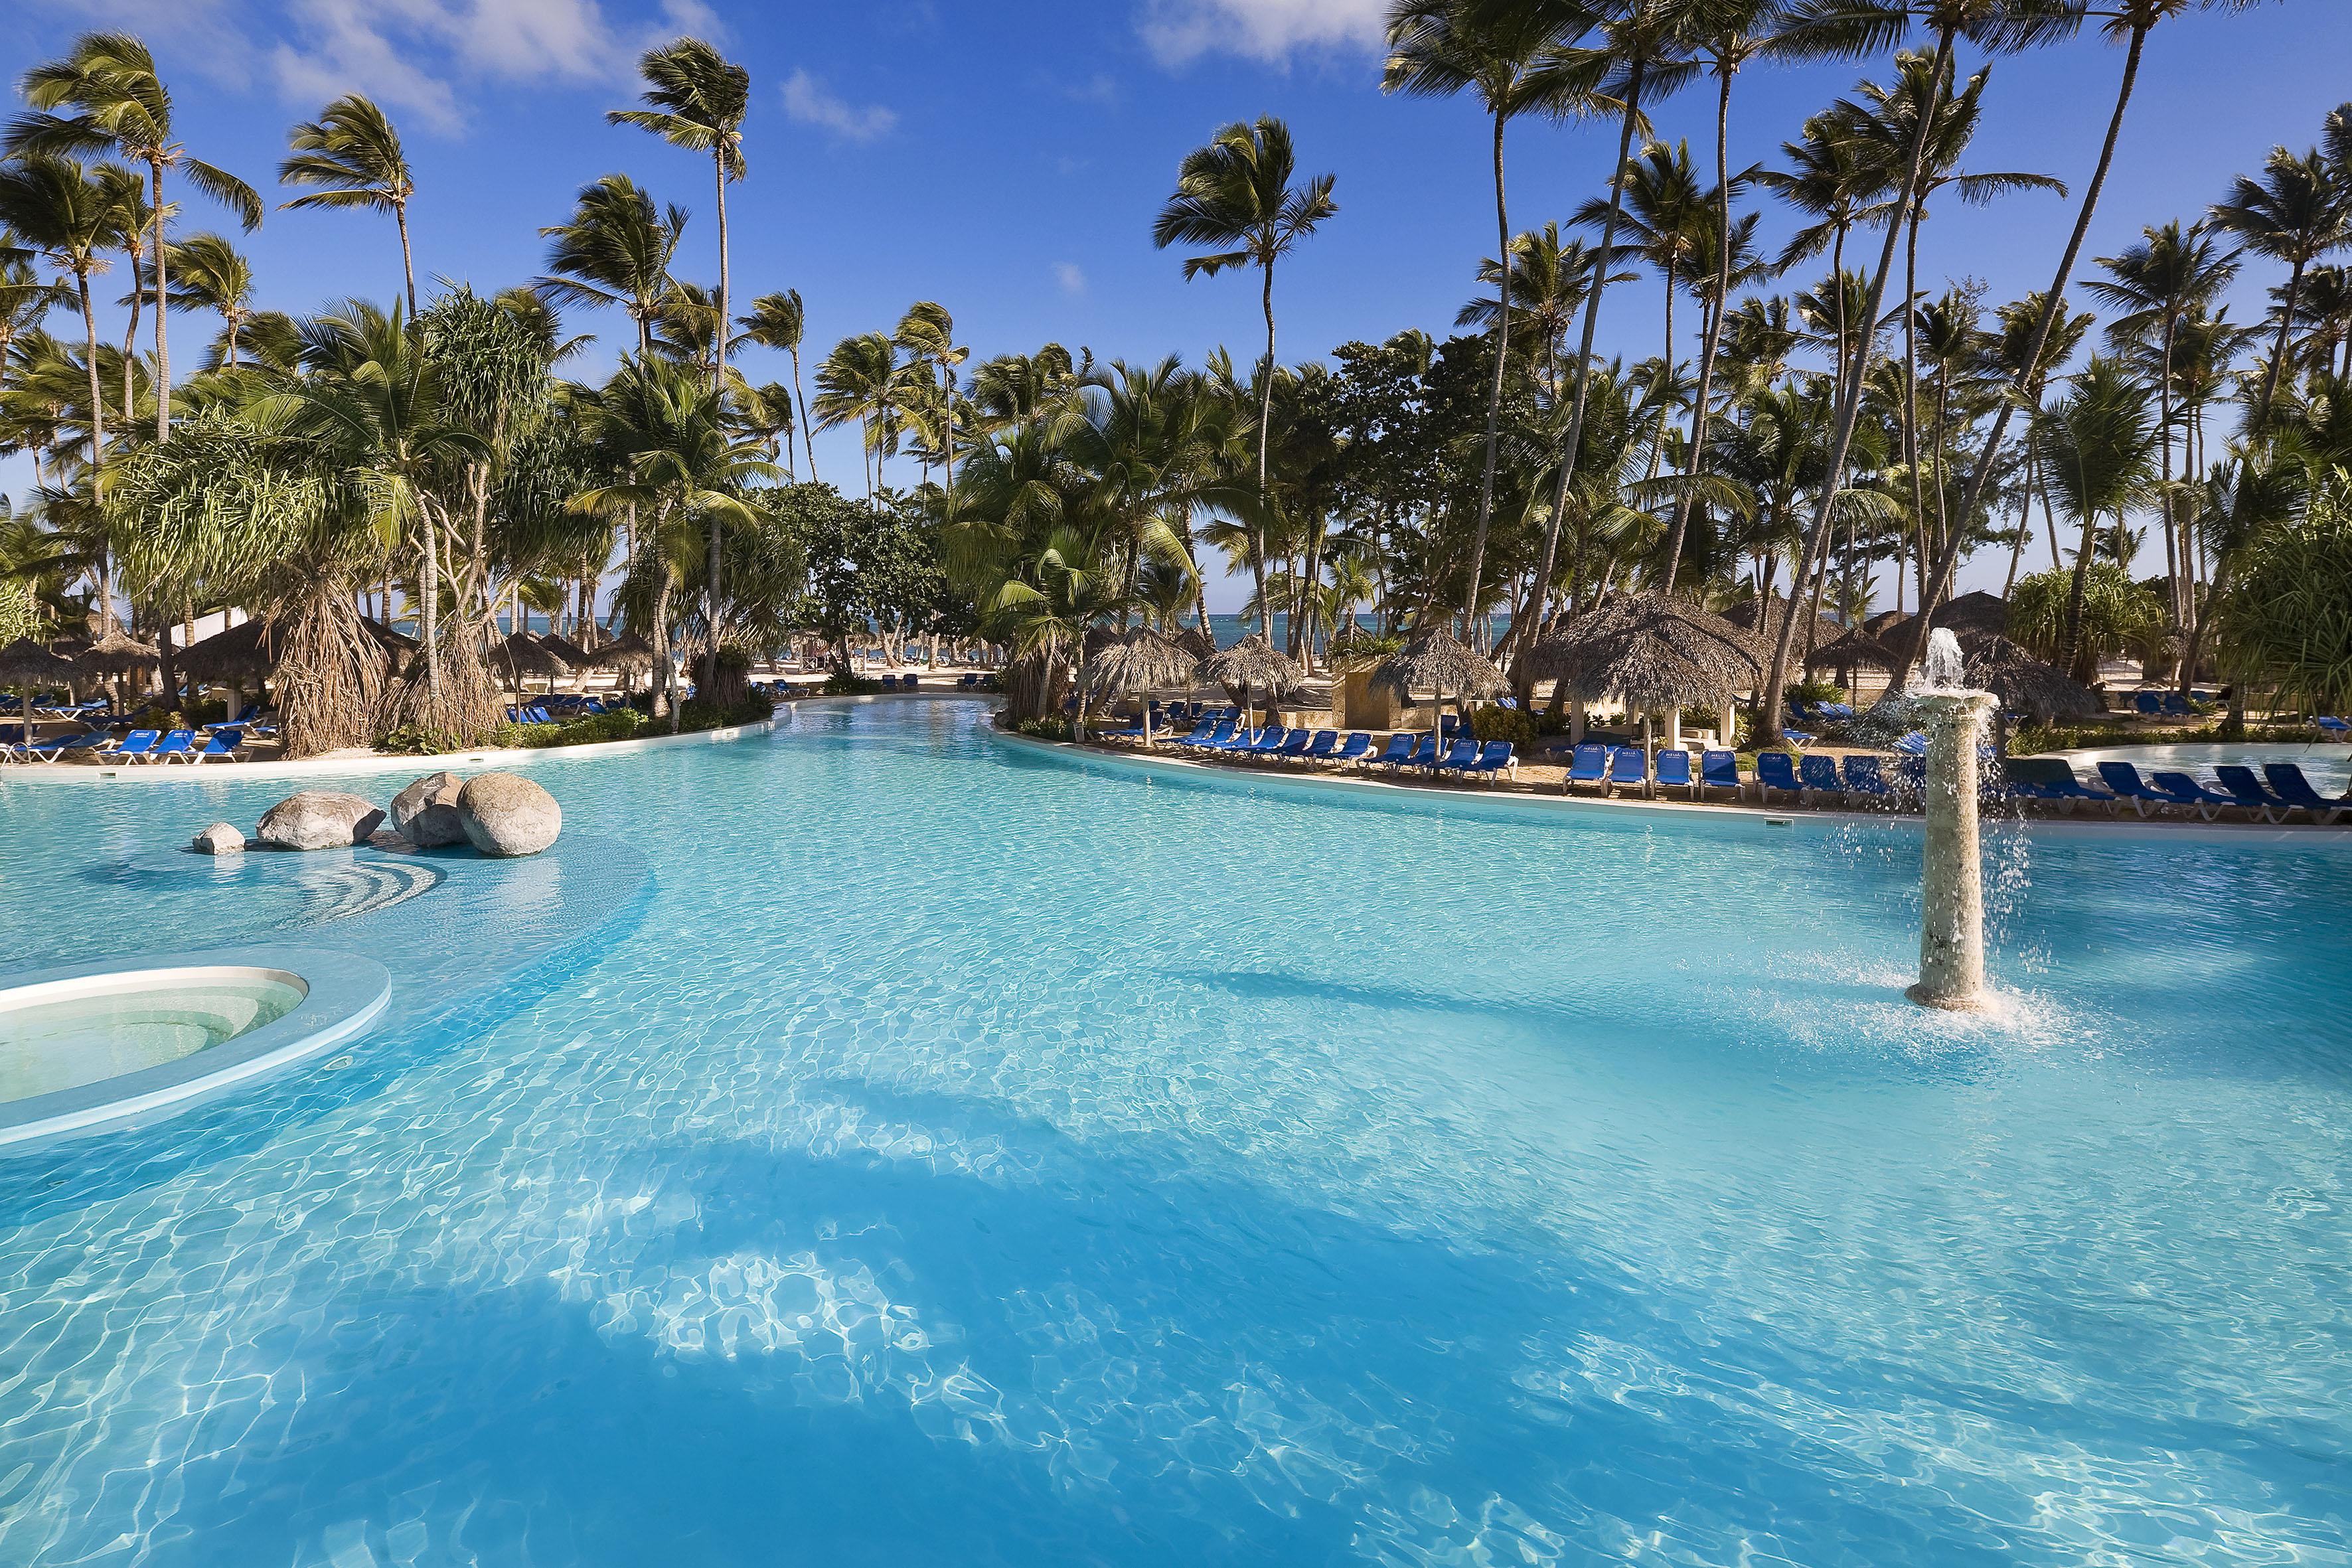 Melia Caribe Tropical piscina.jpg